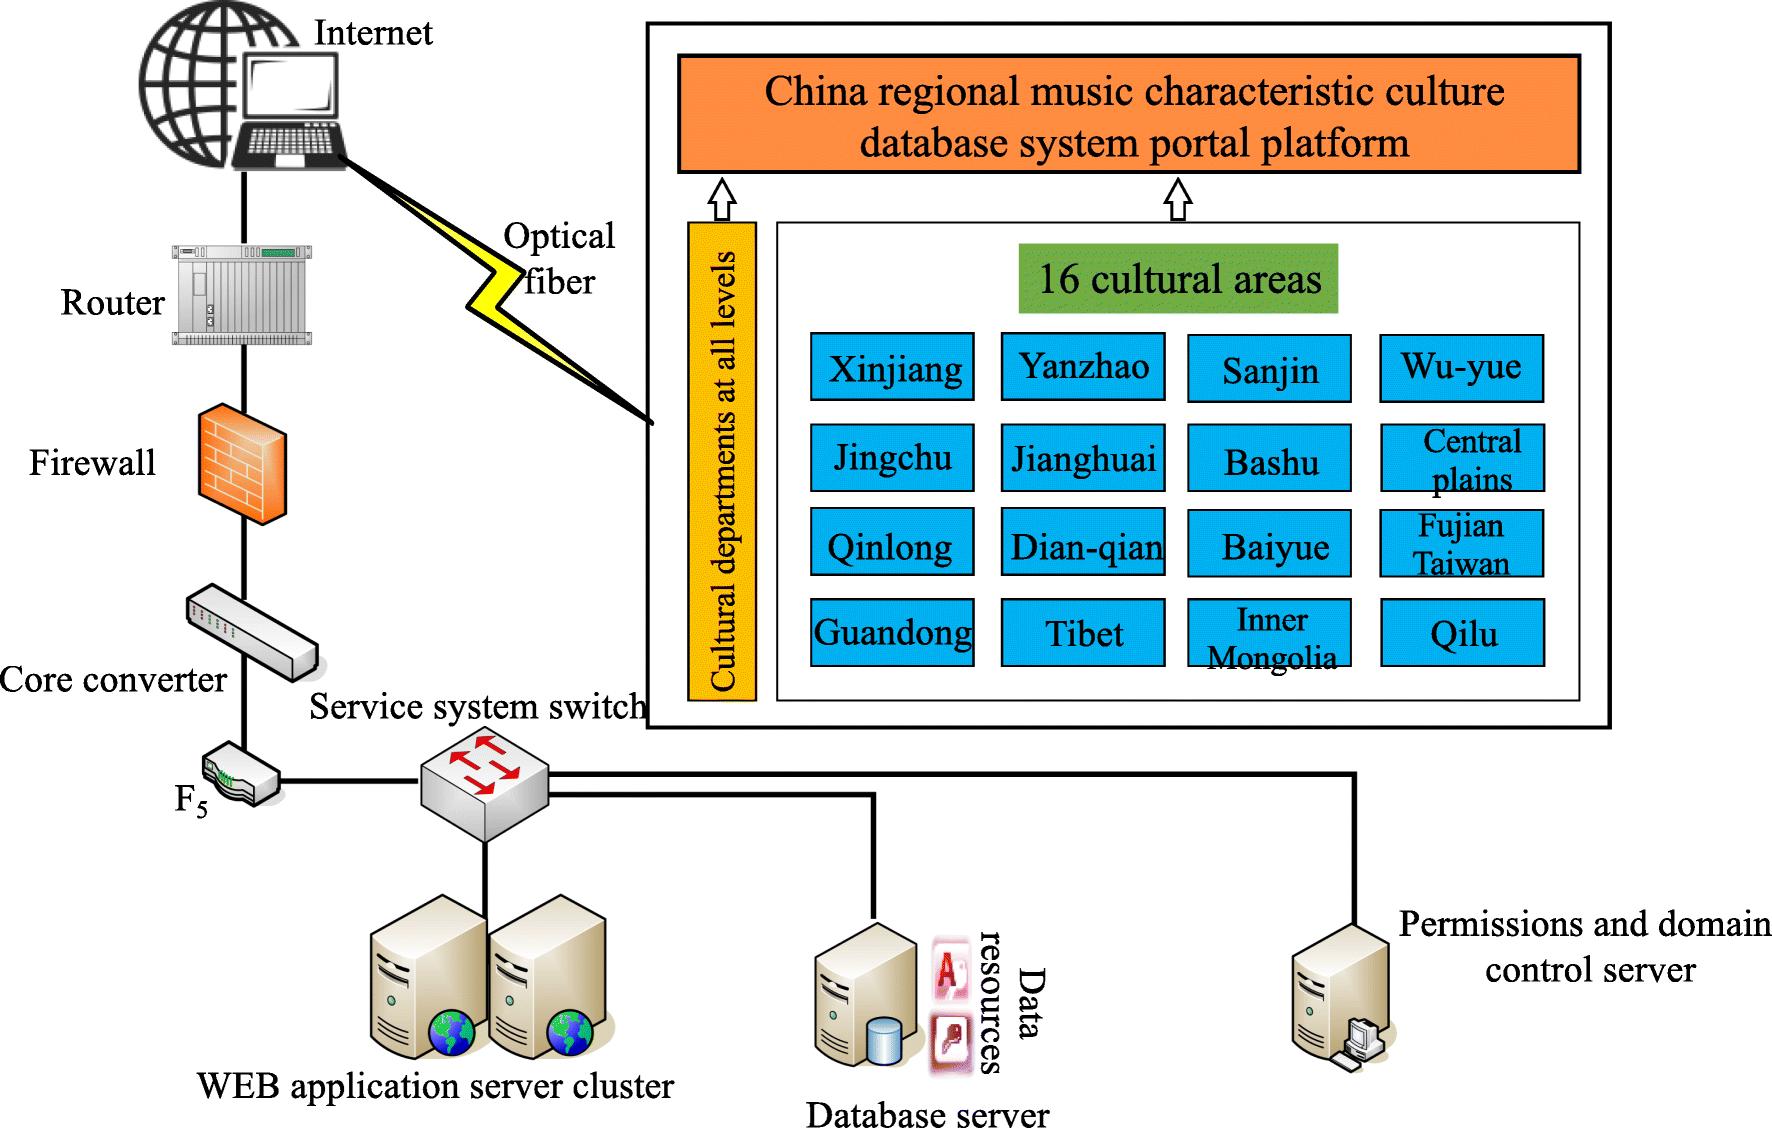 Database design of regional music characteristic culture